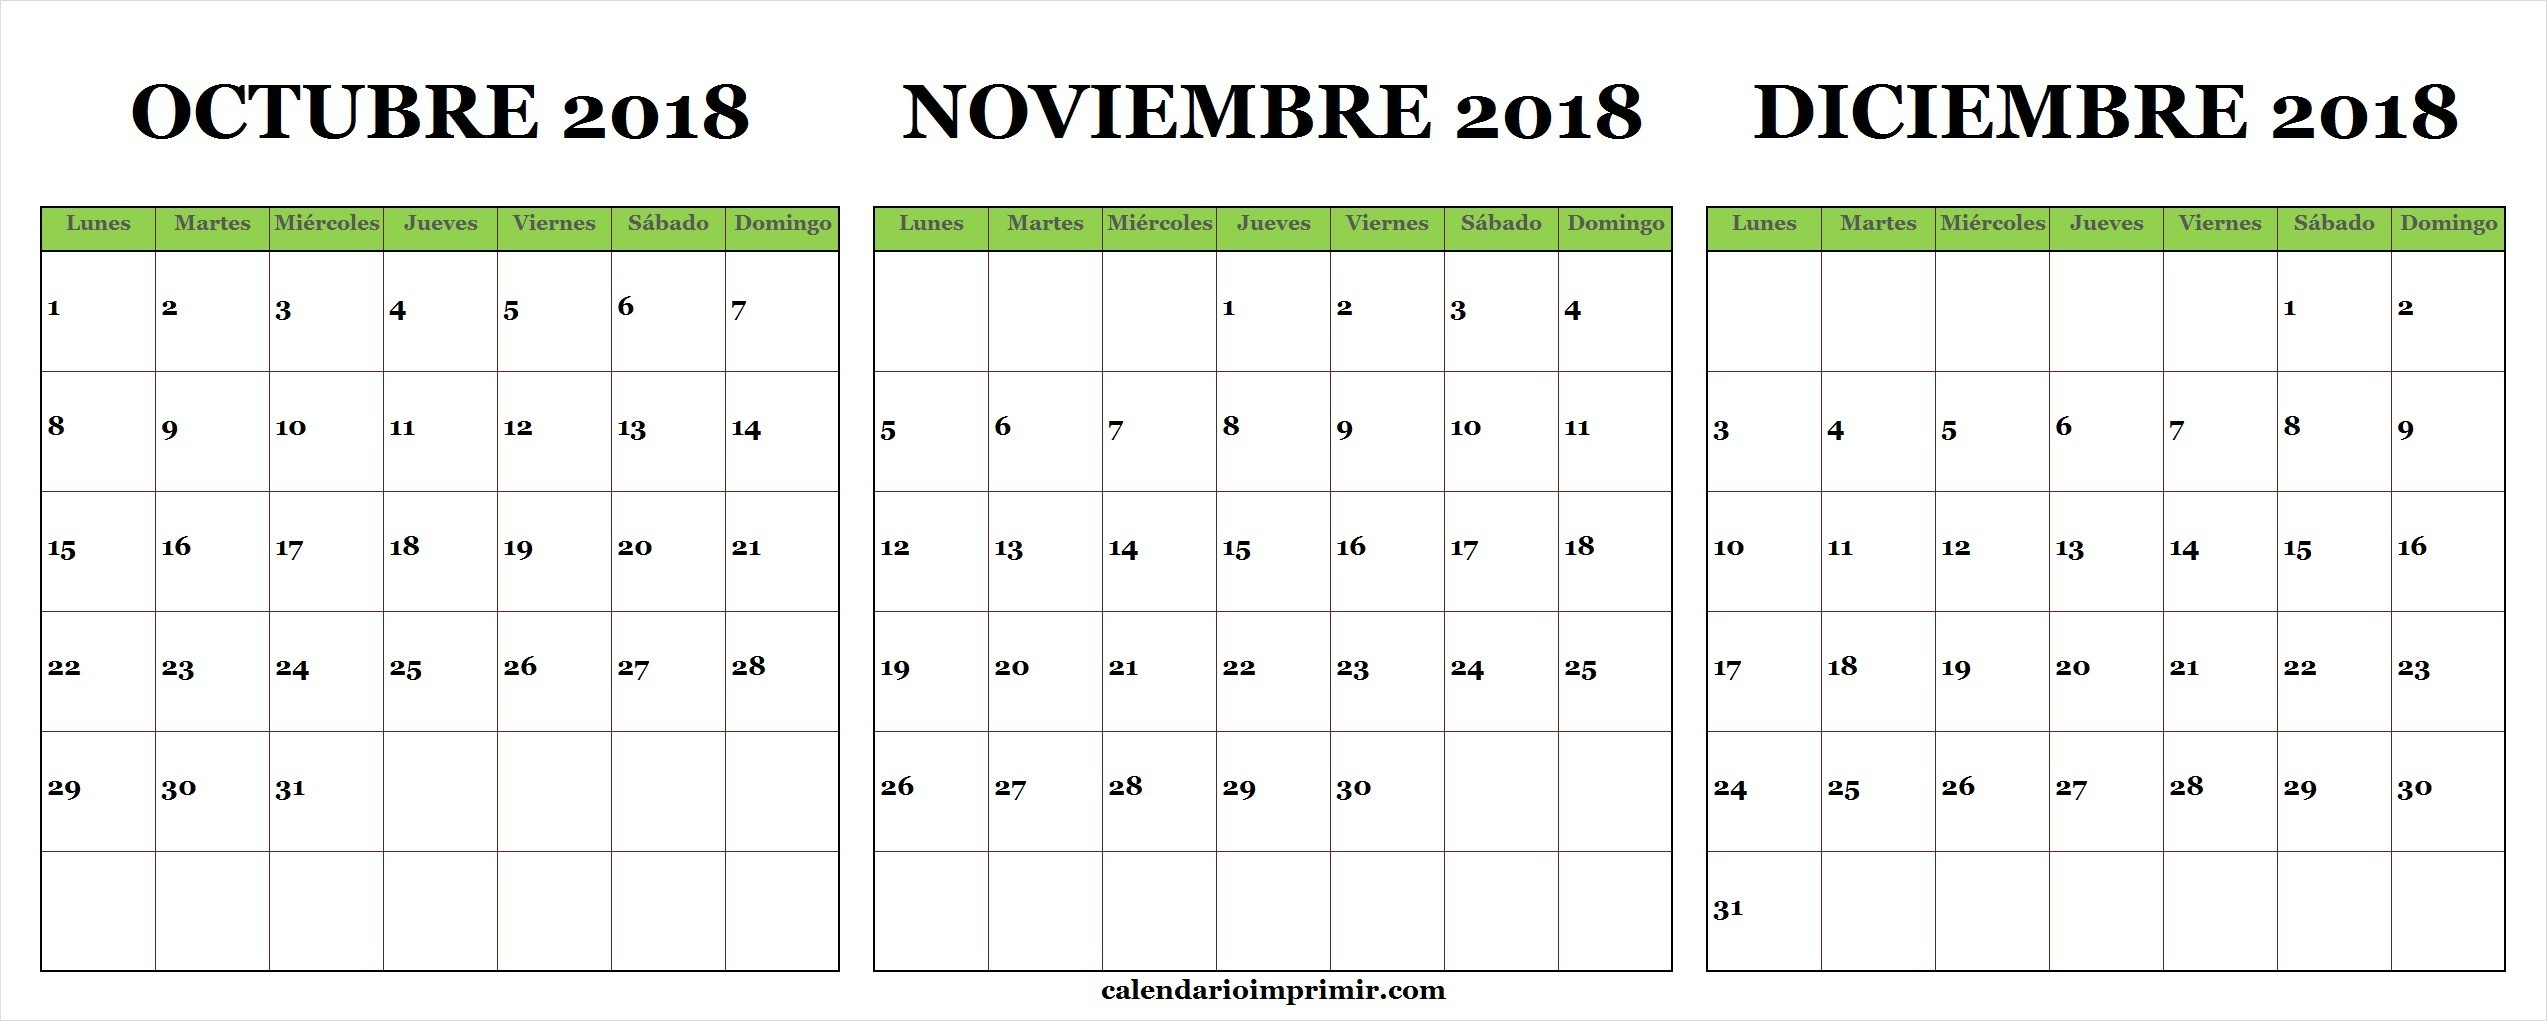 Imprimir Calendario Agosto Septiembre Octubre Noviembre Diciembre 2018 Enero 2019 Chile Calendario De Octubre Noviembre Diciembre De 2018 A Partir Del Lunes